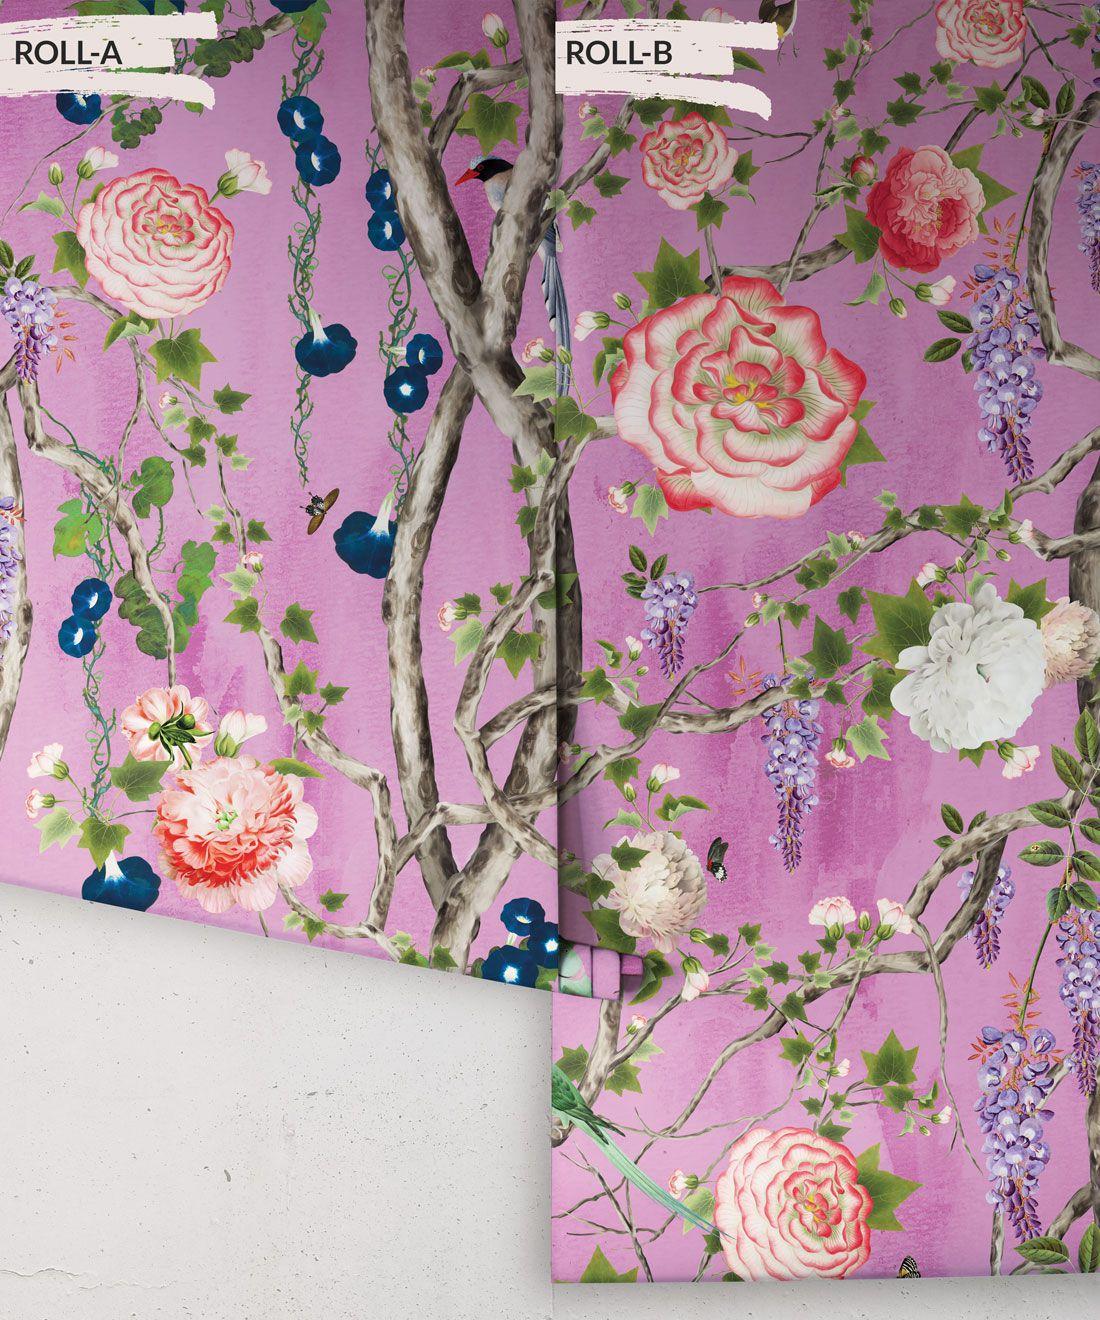 Empress Wallpaper • Romantic Wallpaper • Floral Wallpaper • Chinoiserie Wallpaper • Plum Purple colour wallpaper rolls